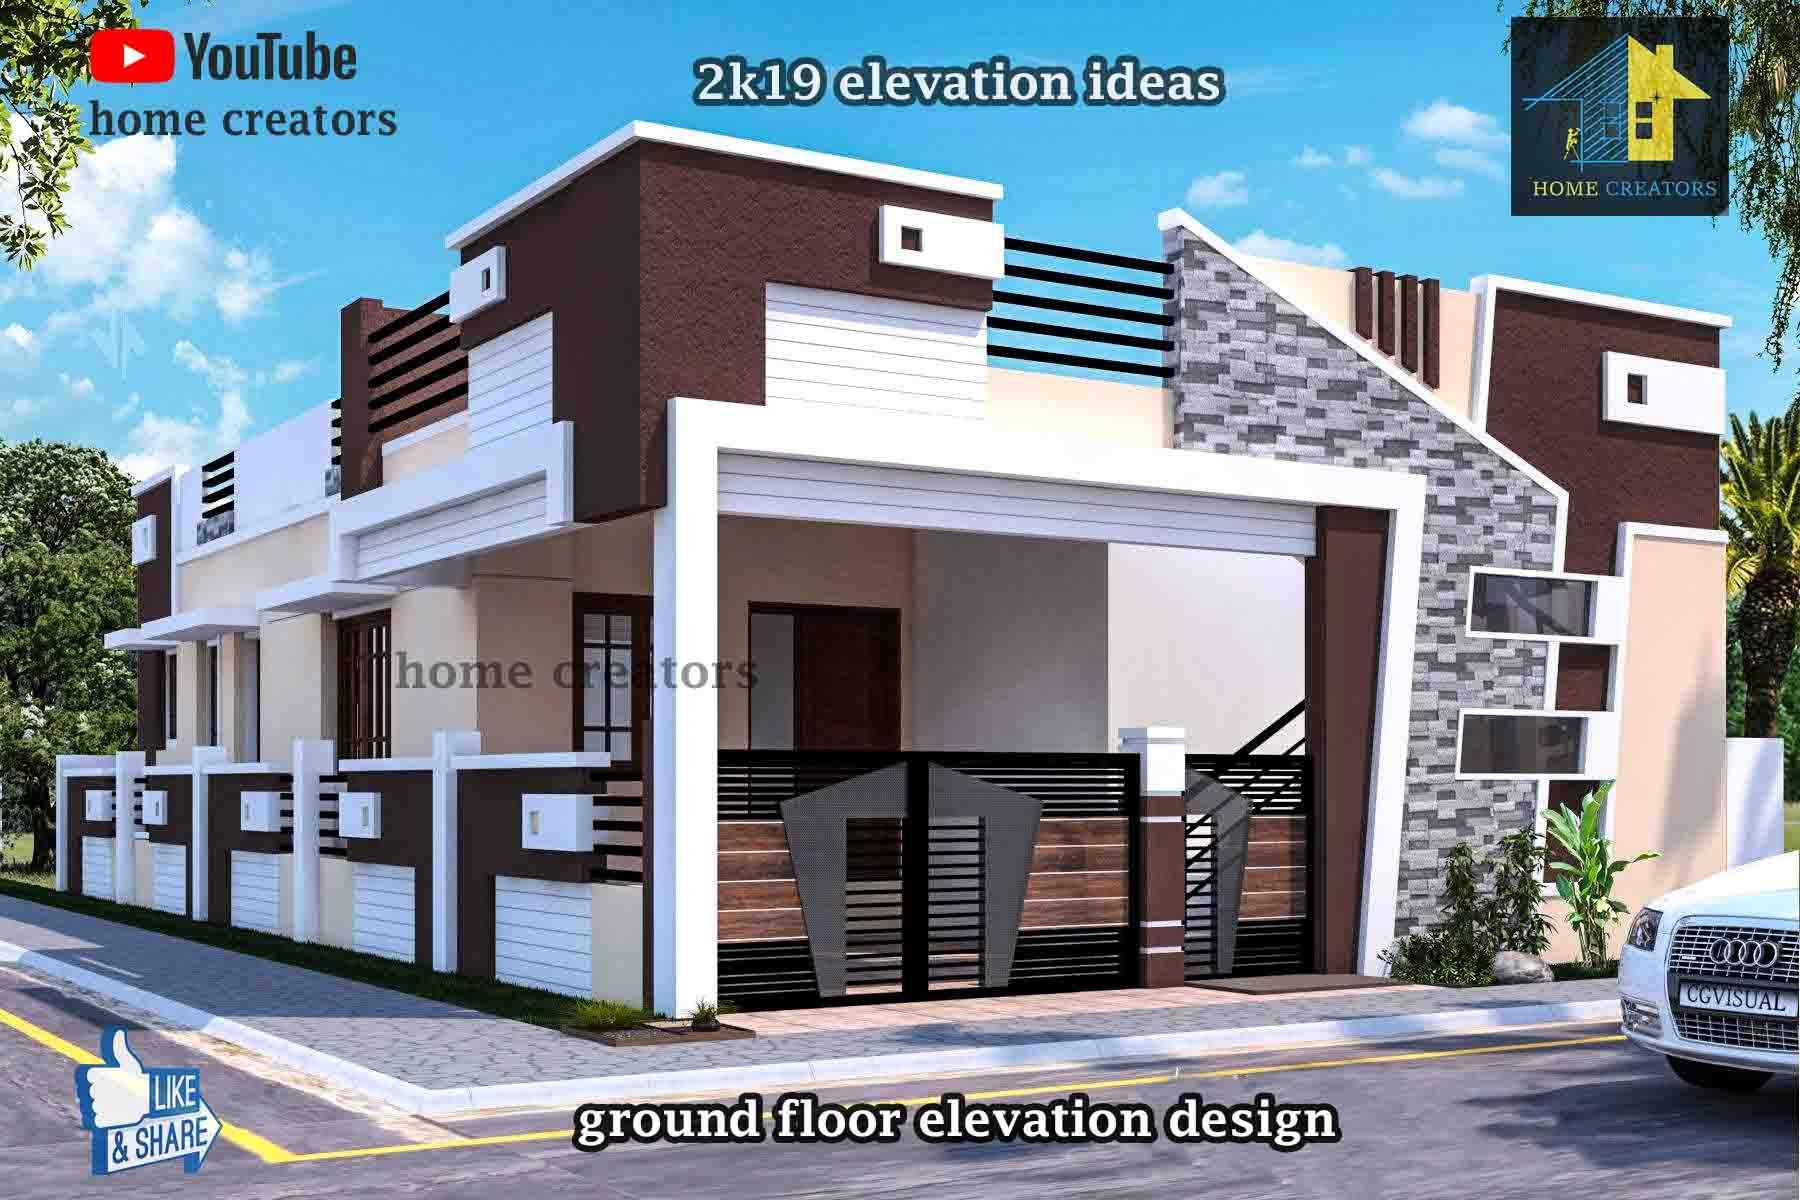 Ground Floor Elevation | Small House Elevation Design, Single Floor House Design, Village House Design